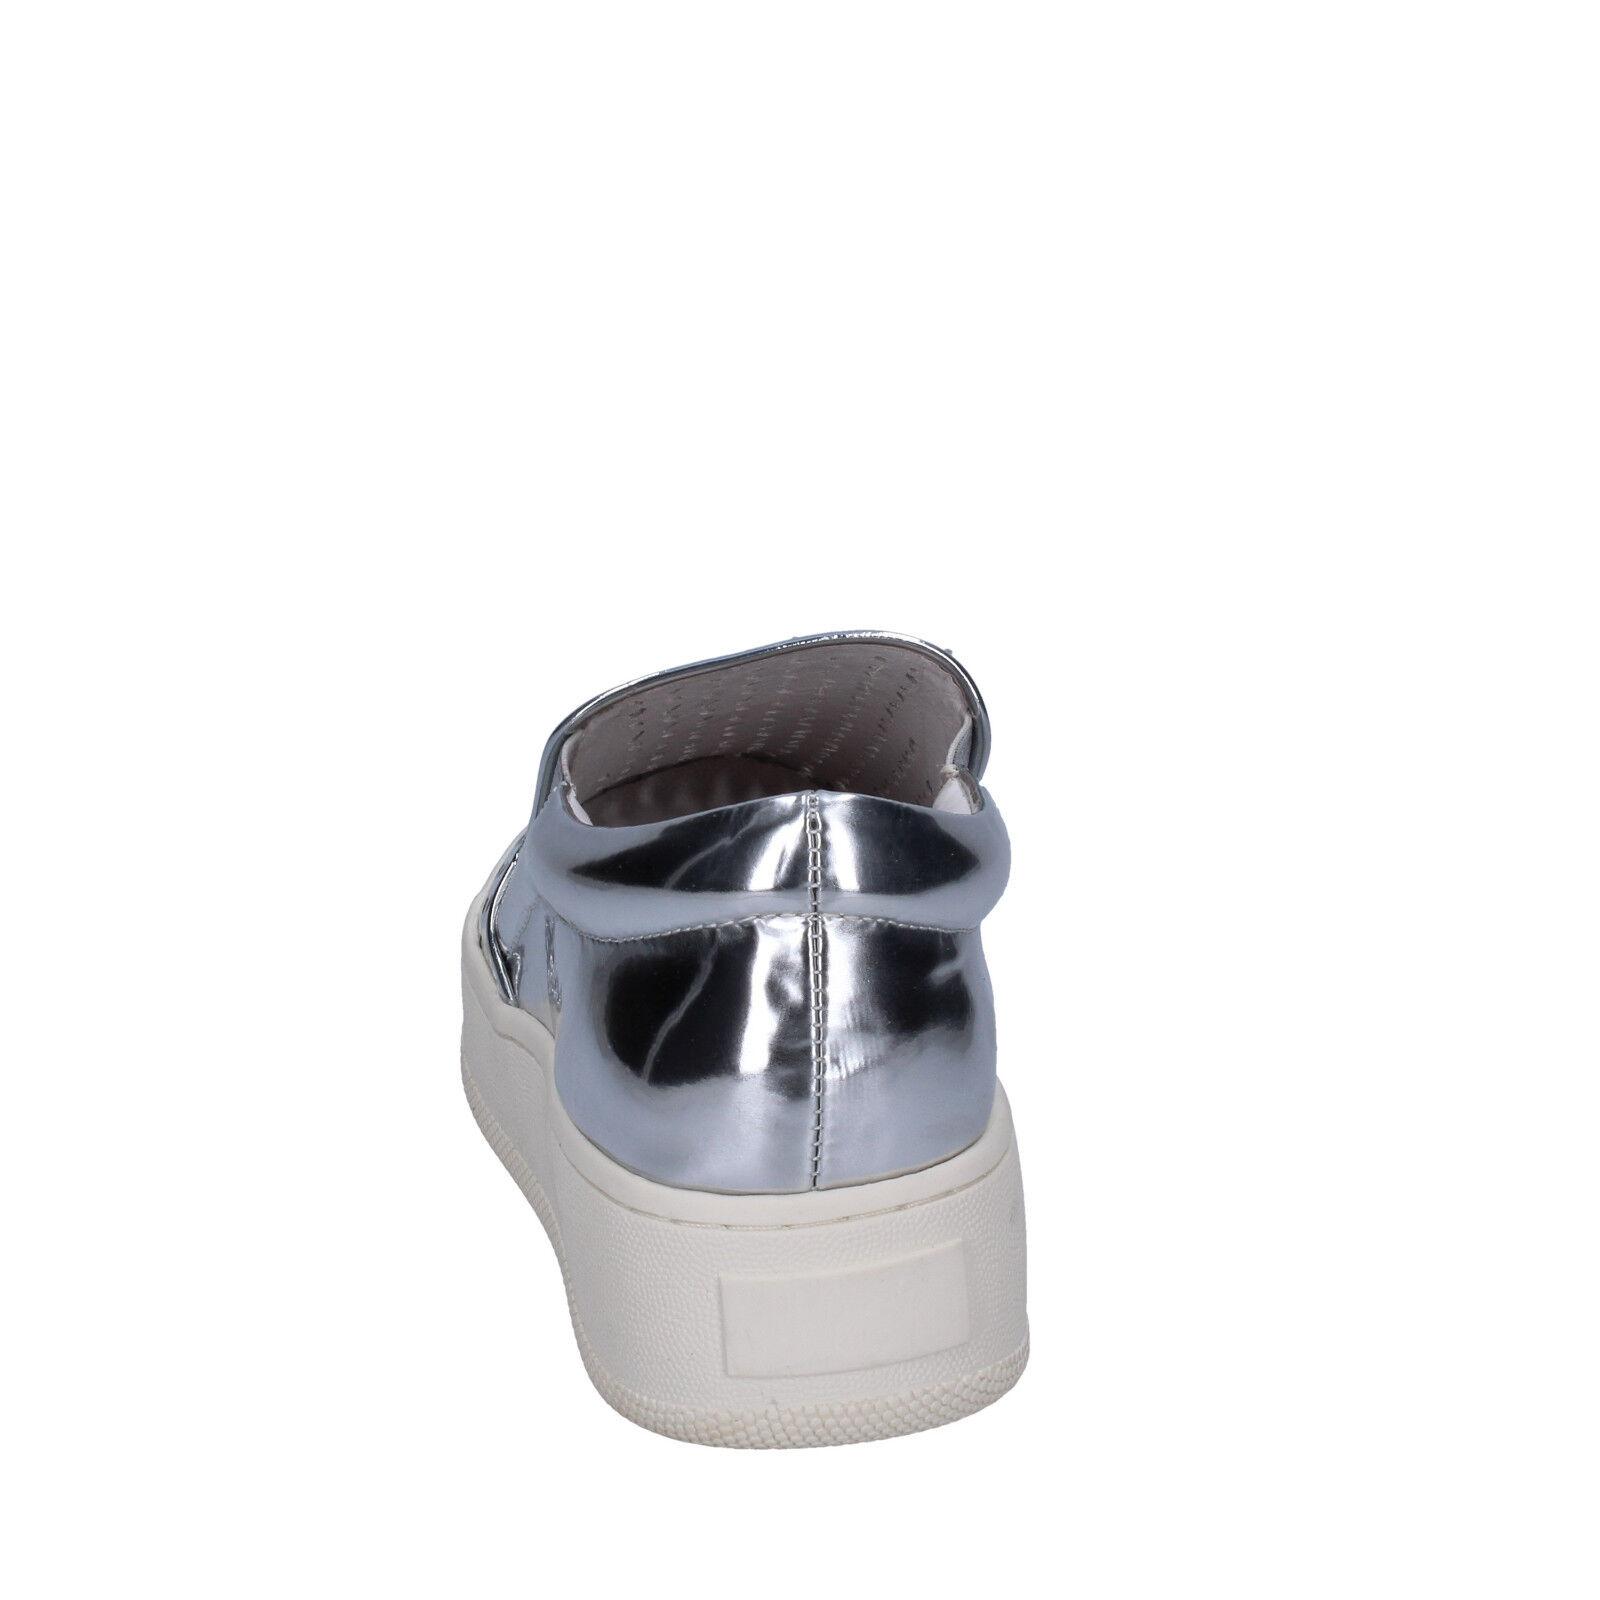 Damenschuhe schuhe UMA PARKER 4 4 PARKER (EU 37) slip on silver Leder BT564-37 05eaf8